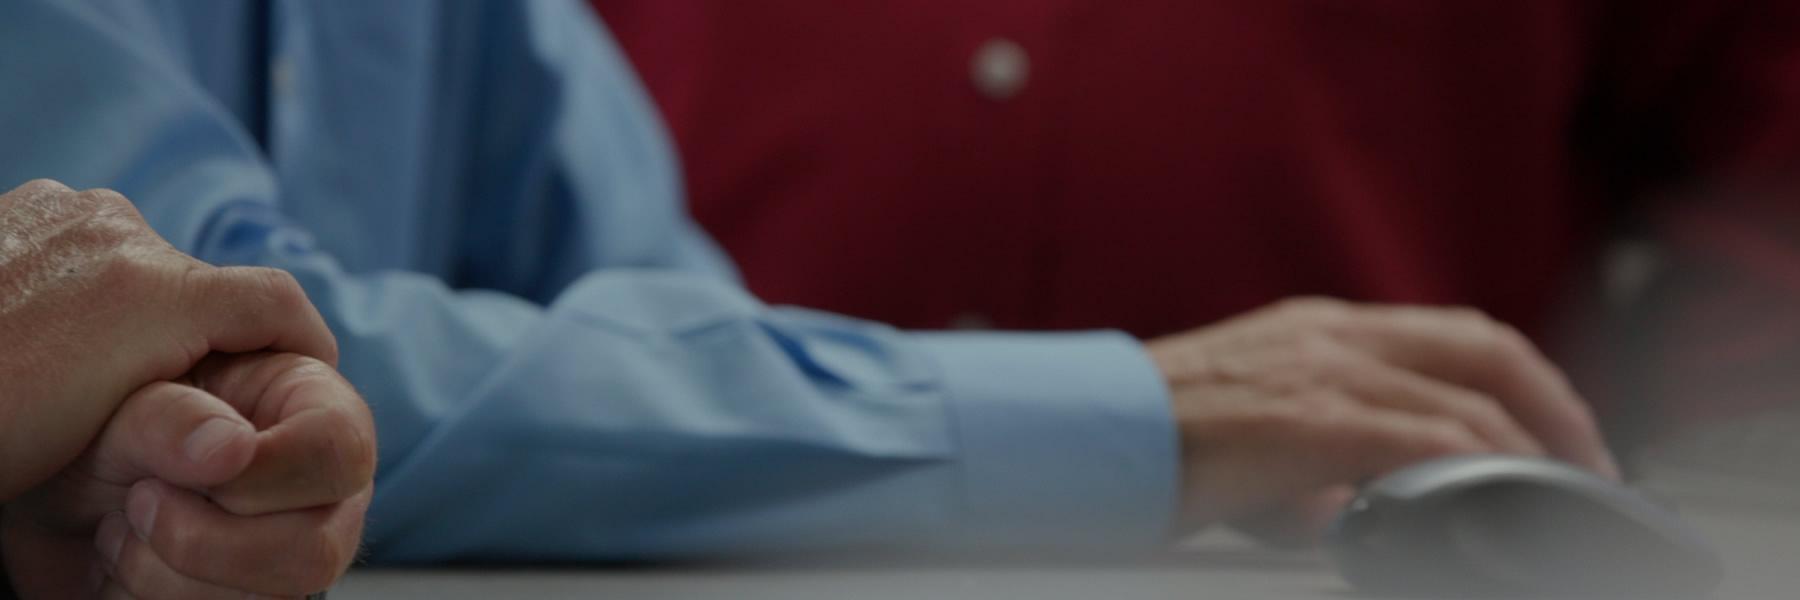 Advanced Business Methods - Banner